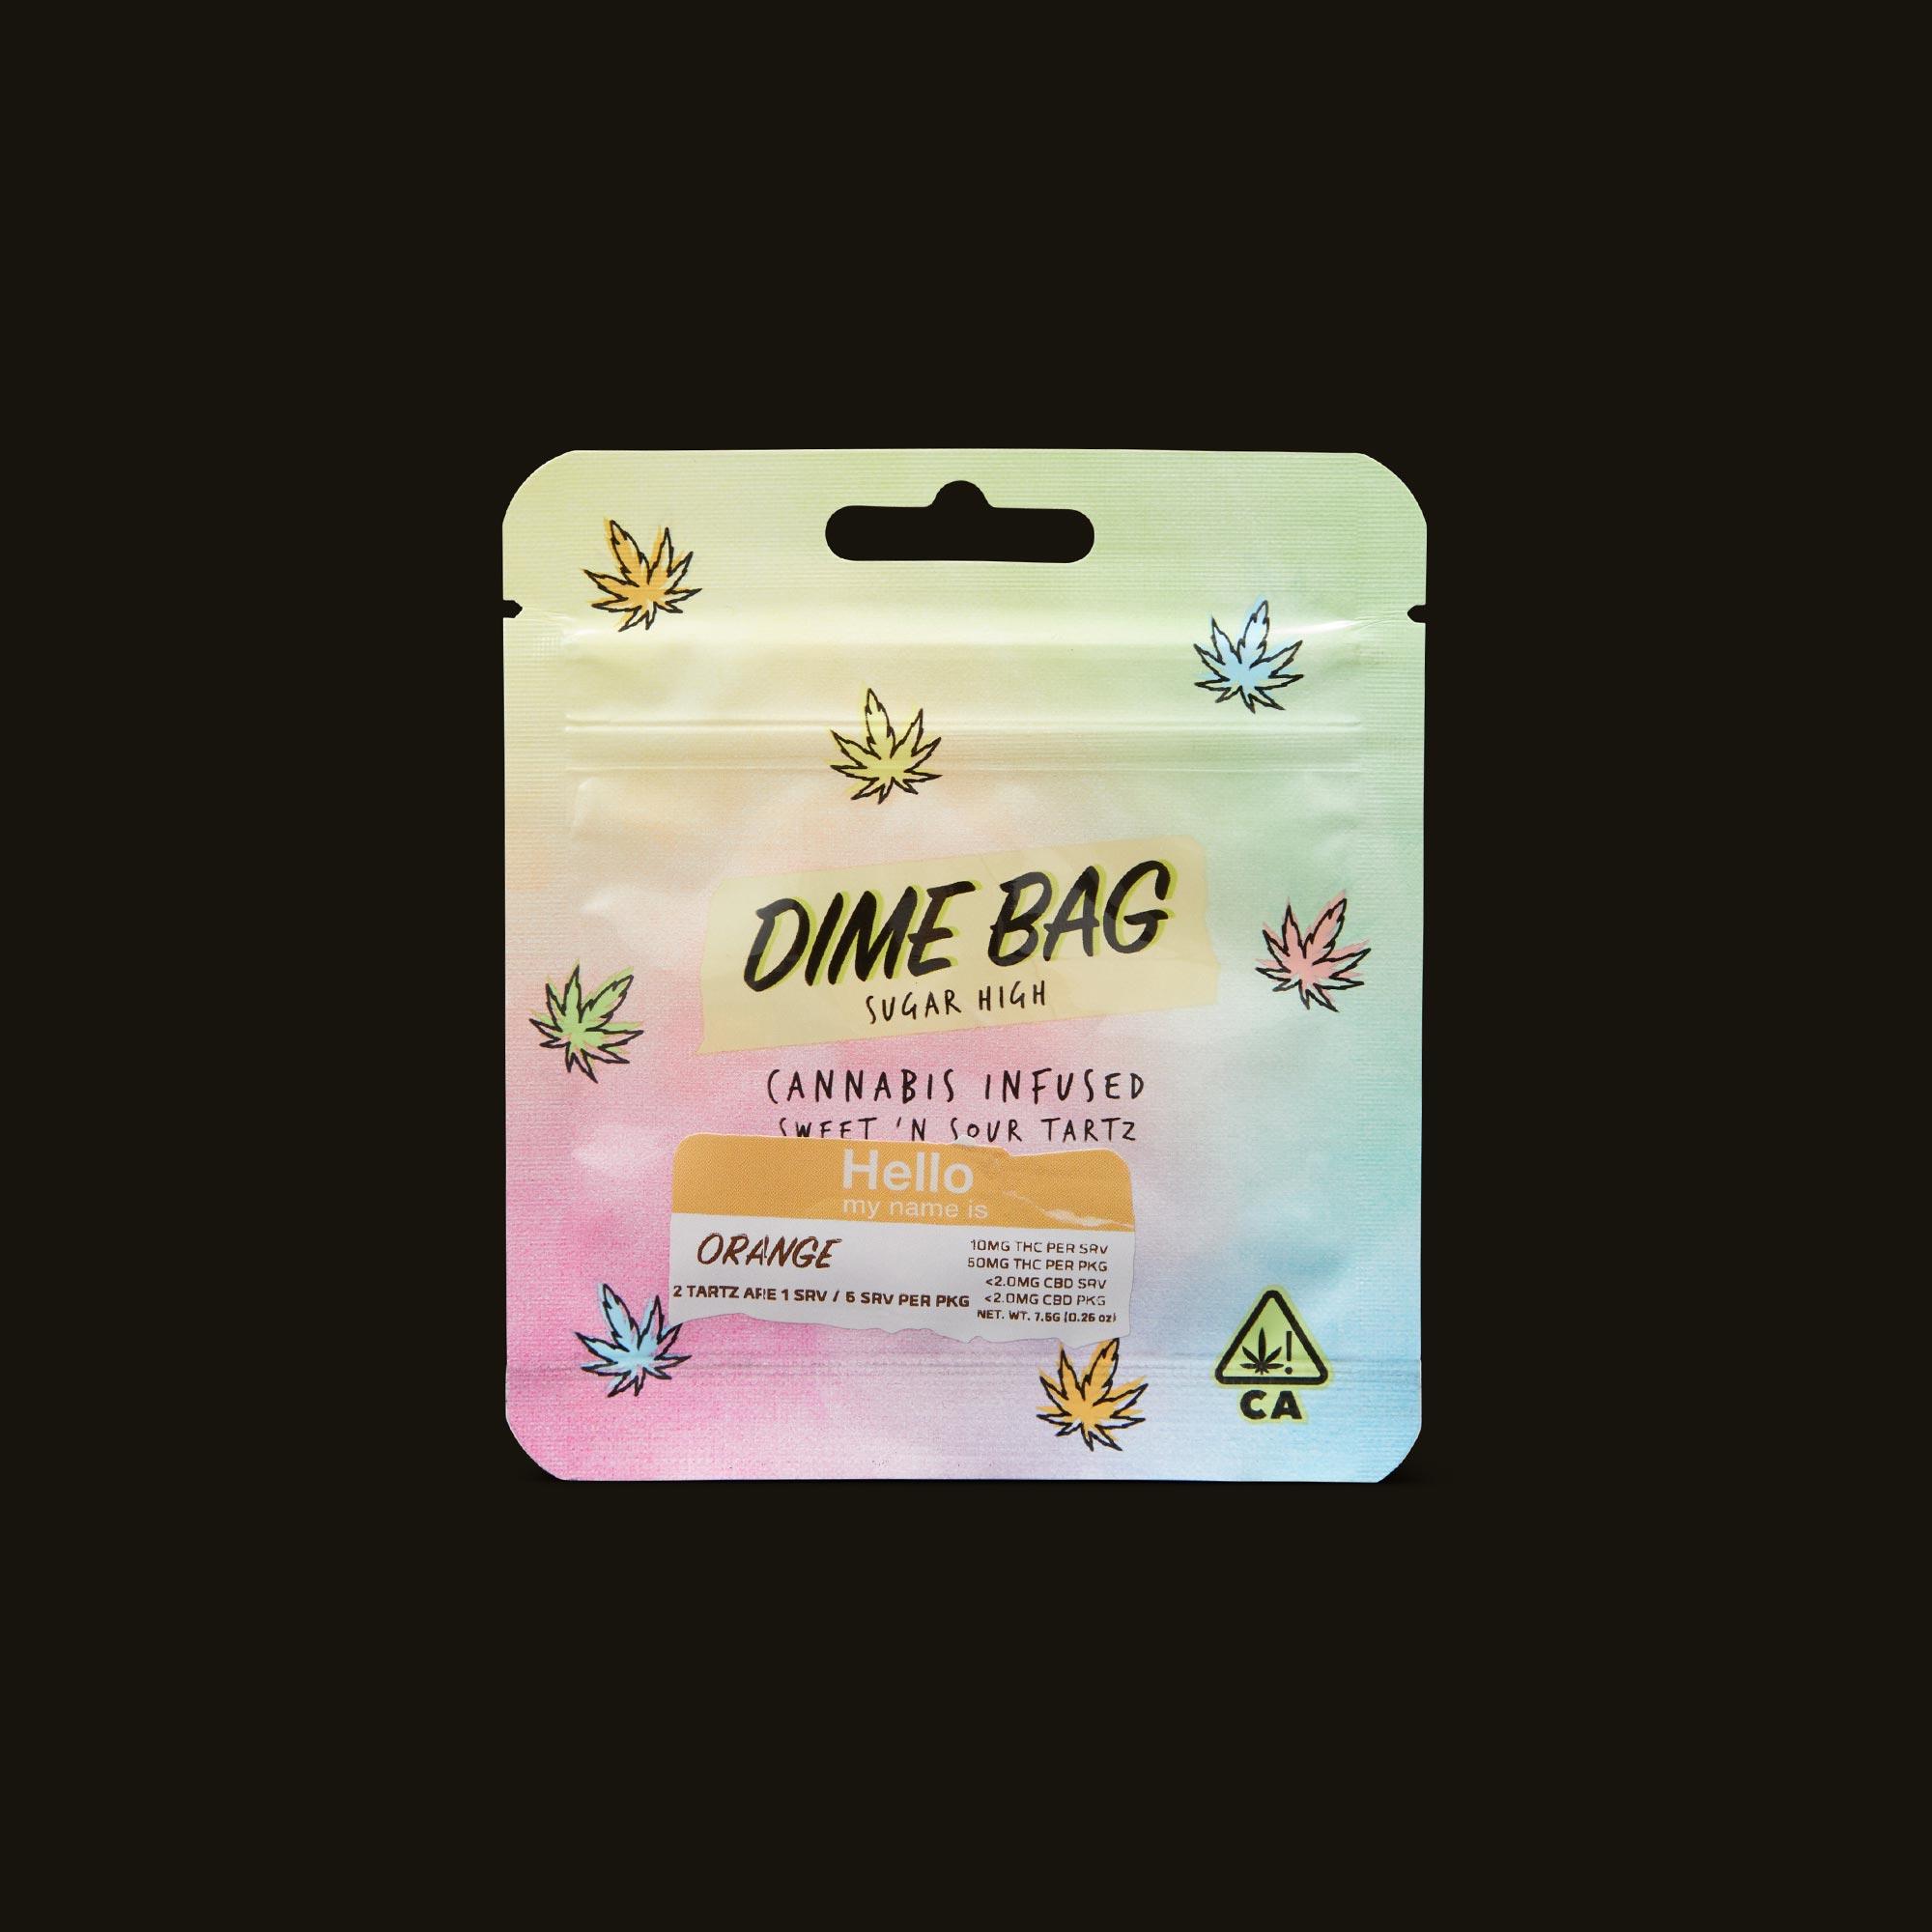 Dime Bag Orange Sweet N' Sour Tartz Front Packaging